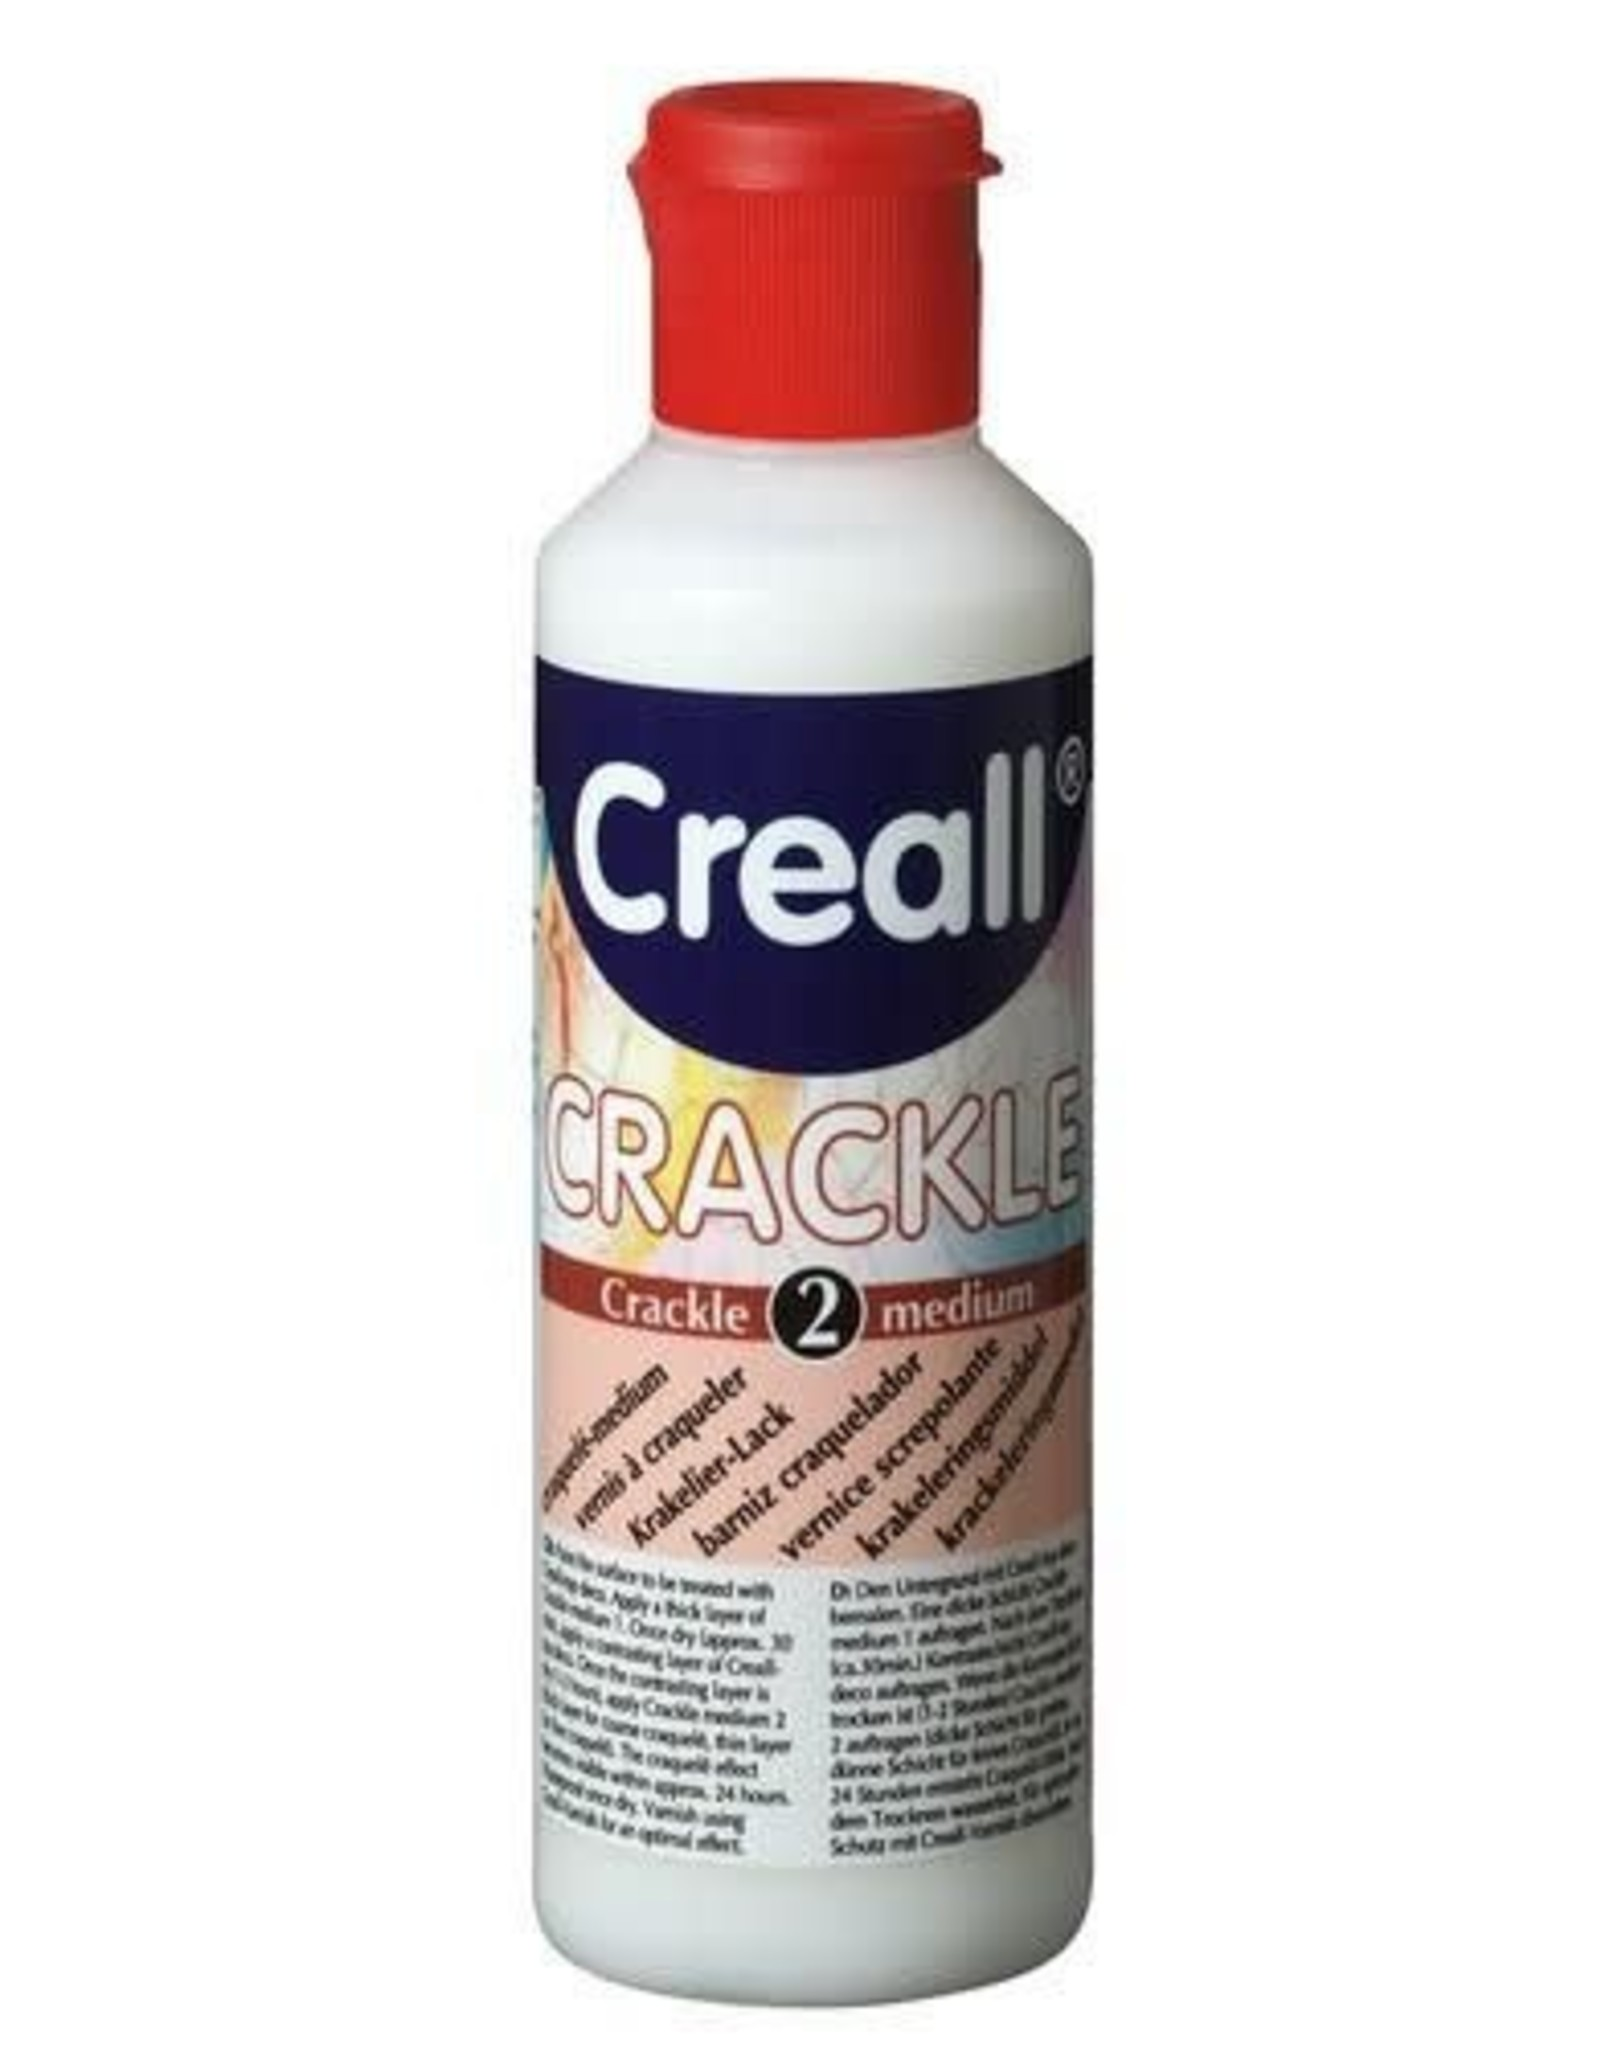 Creall Creall Crackle - craquelé medium stap 2 (80 ML)